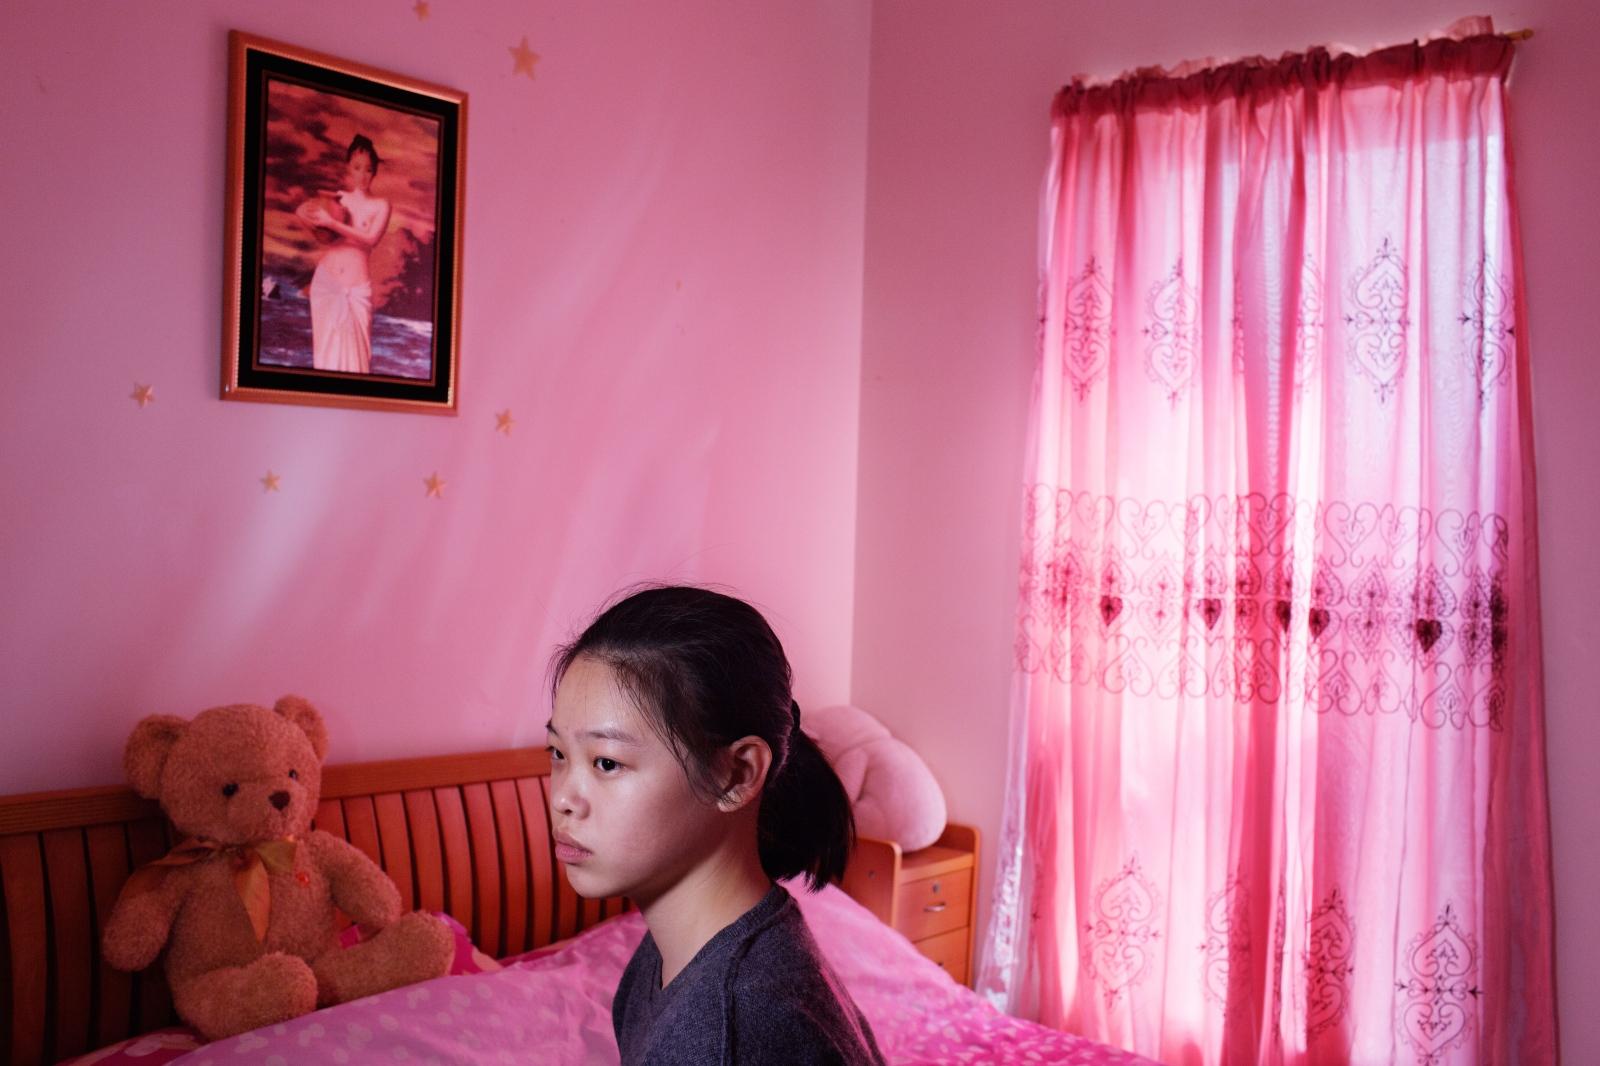 Jennifer Liu at home, Brooklyn 珍妮弗,八大道布鲁克林